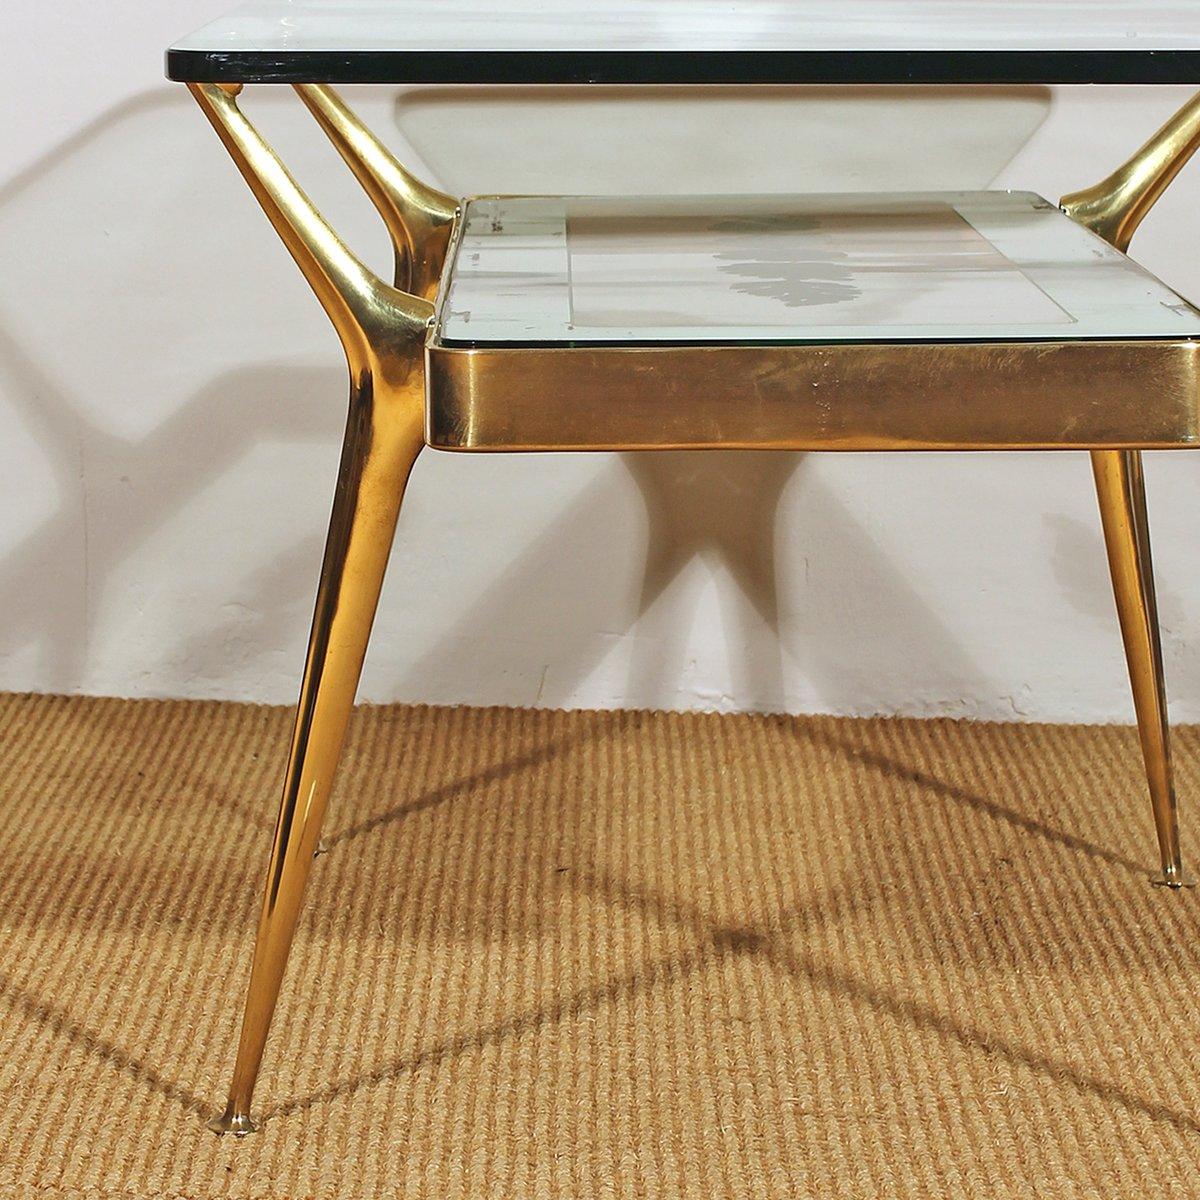 Italian Glass & Brass Coffee Table, 1950s 7. $2,688.00. Price per piece - Italian Glass & Brass Coffee Table, 1950s For Sale At Pamono